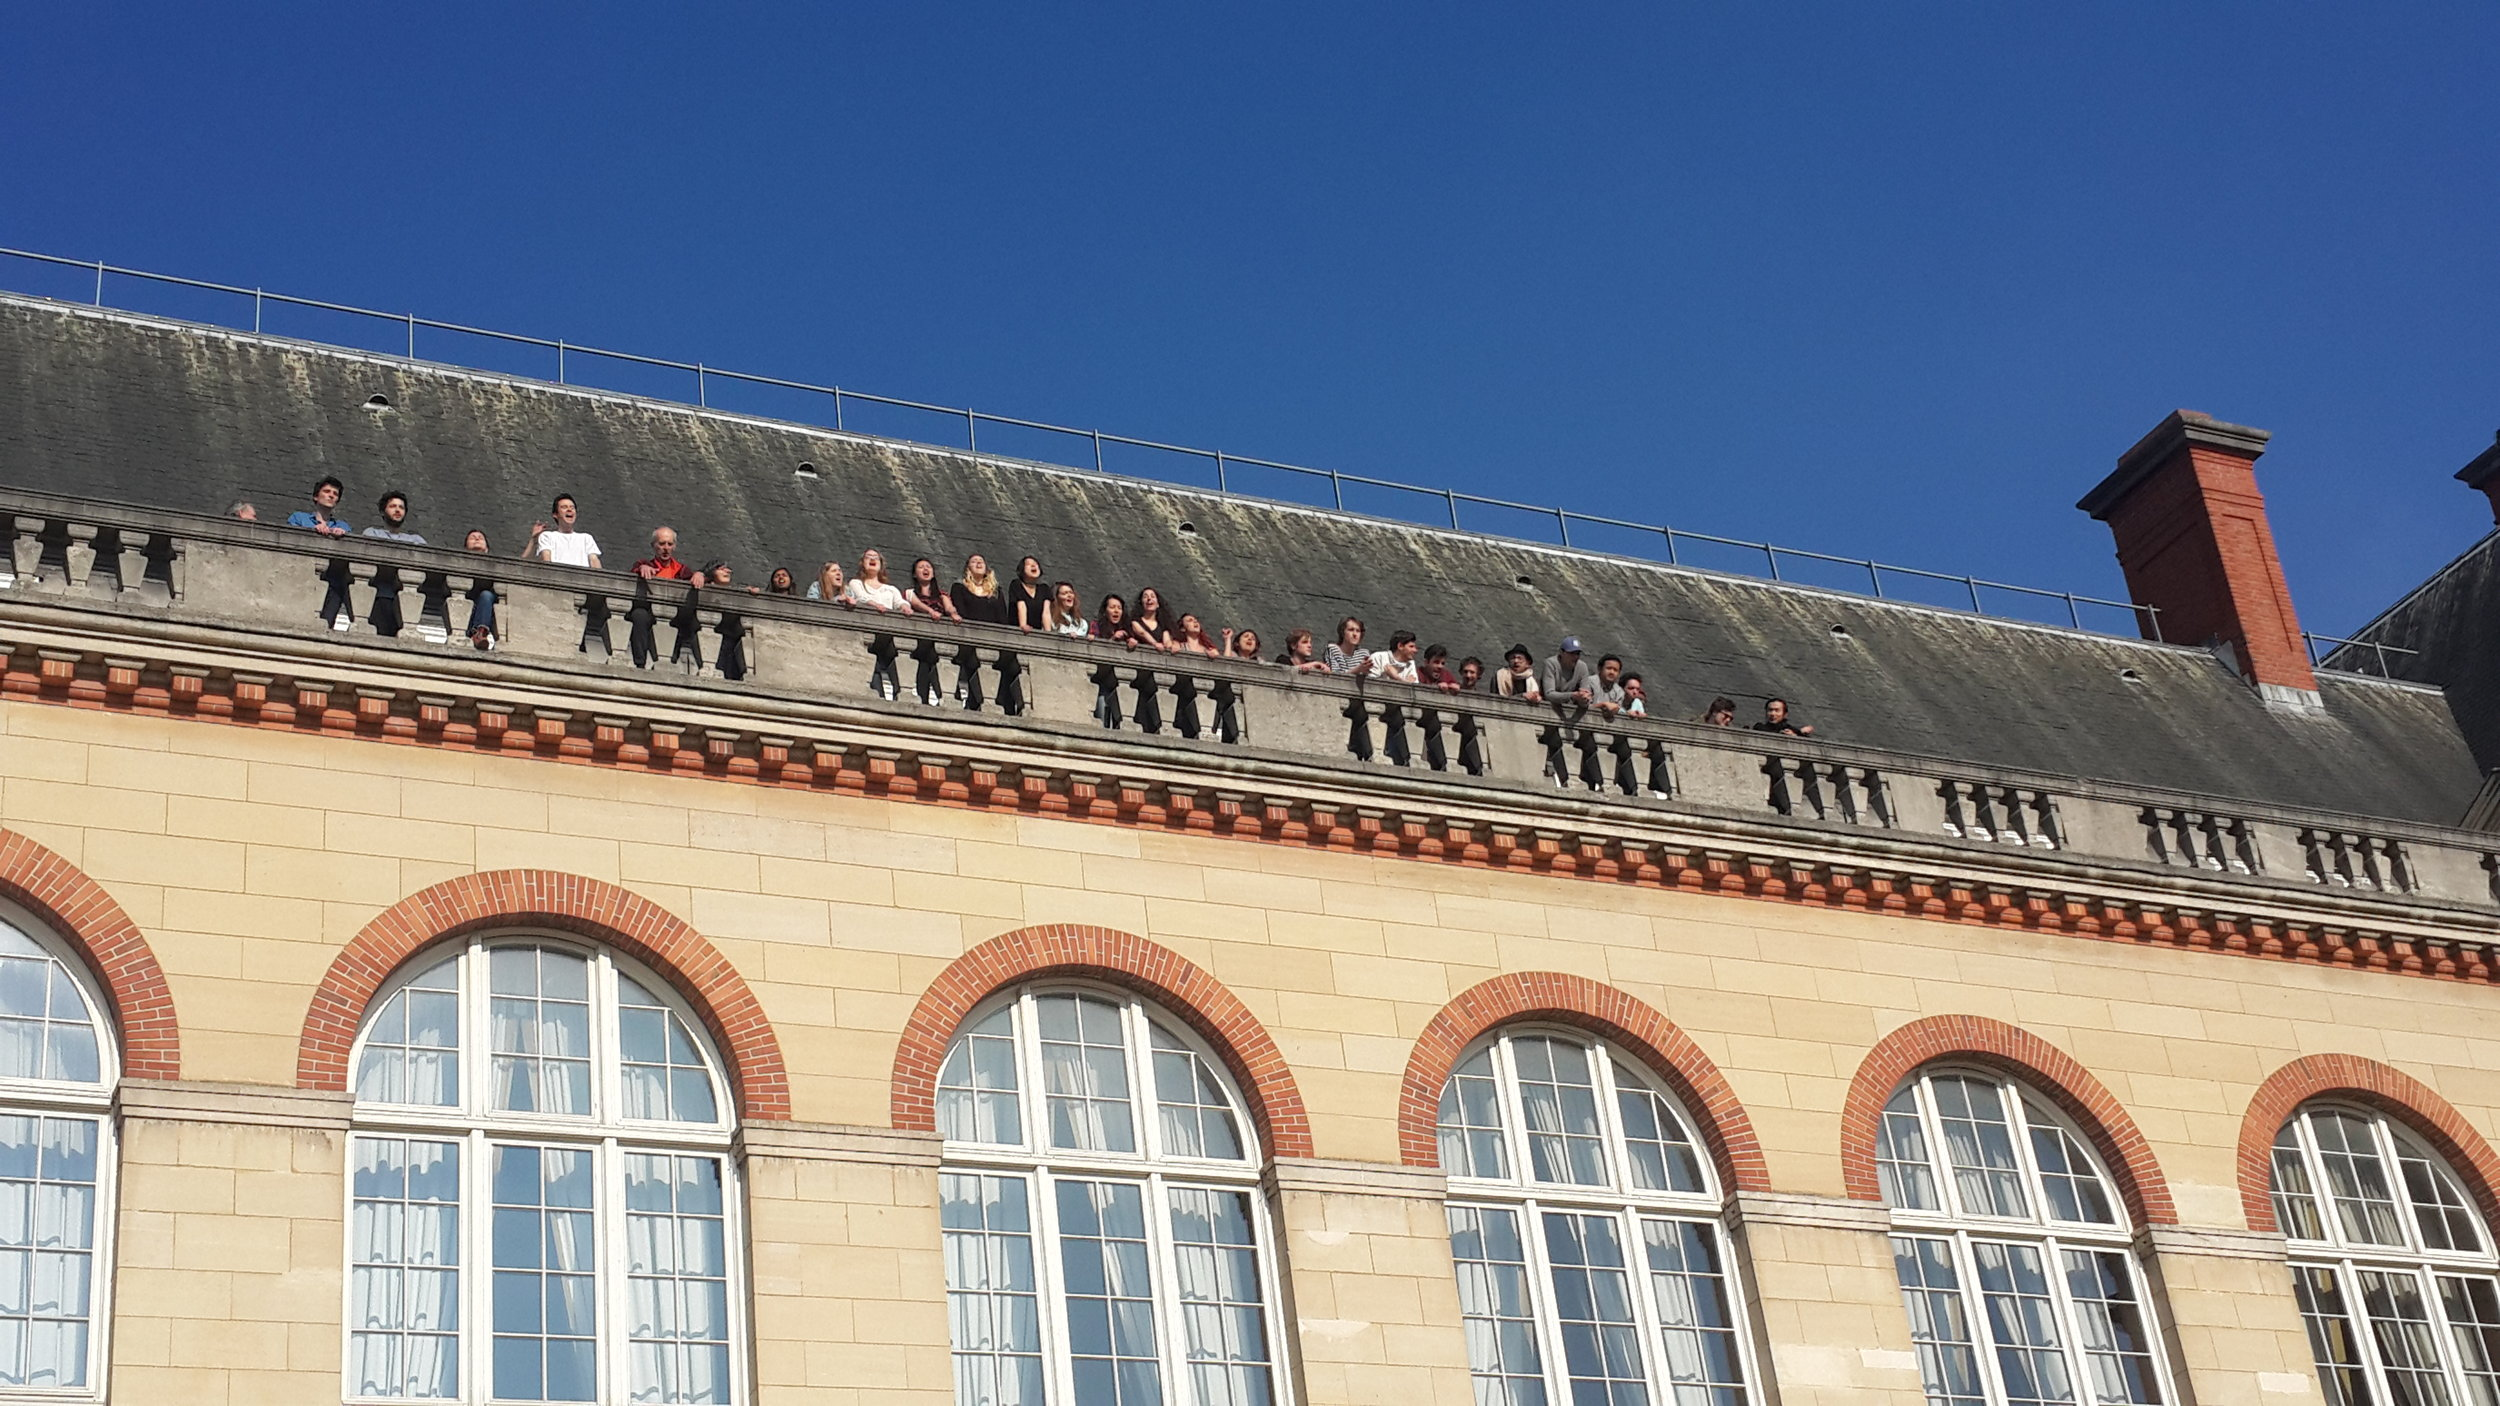 #song #rehearsals #tci #balcony